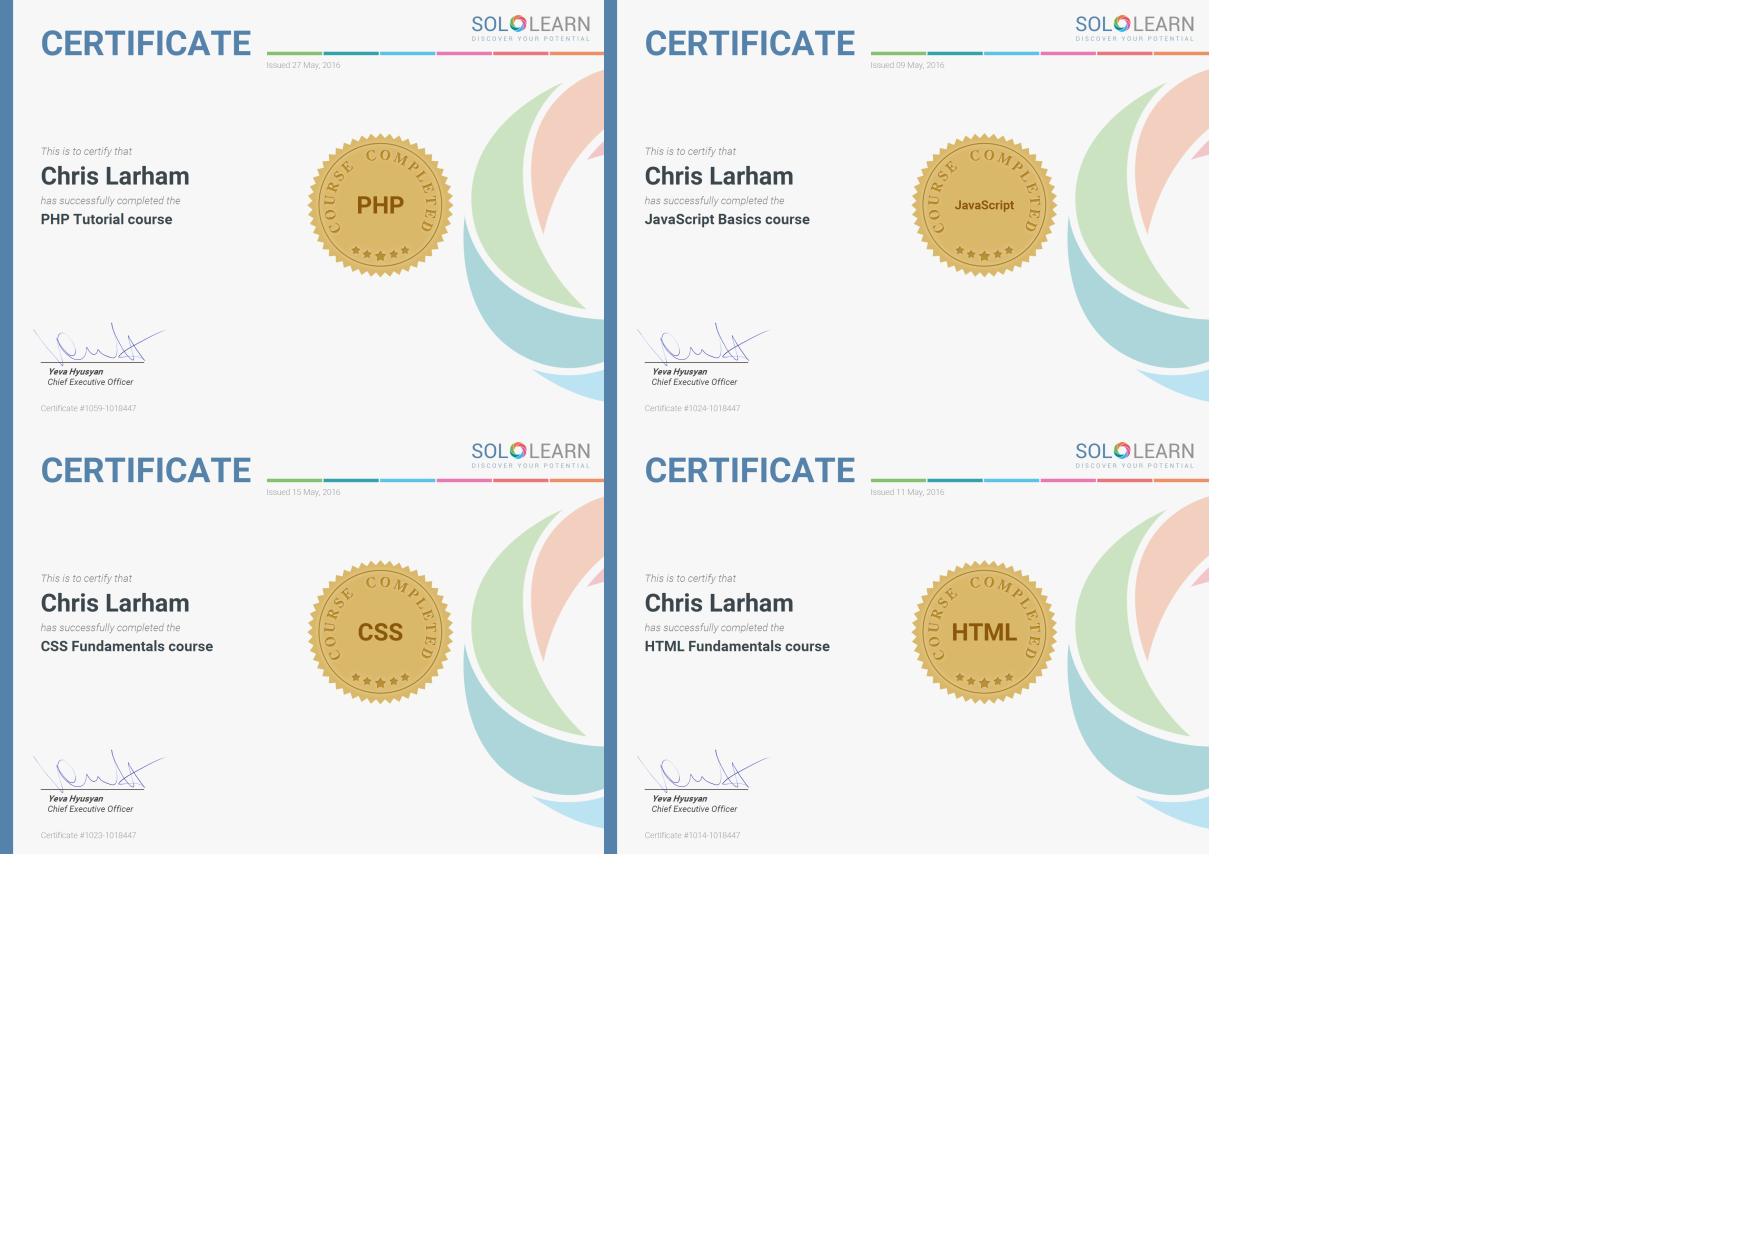 Sololearn certification 2016 sharedsapiencefo sololearn certification 2016 xflitez Images